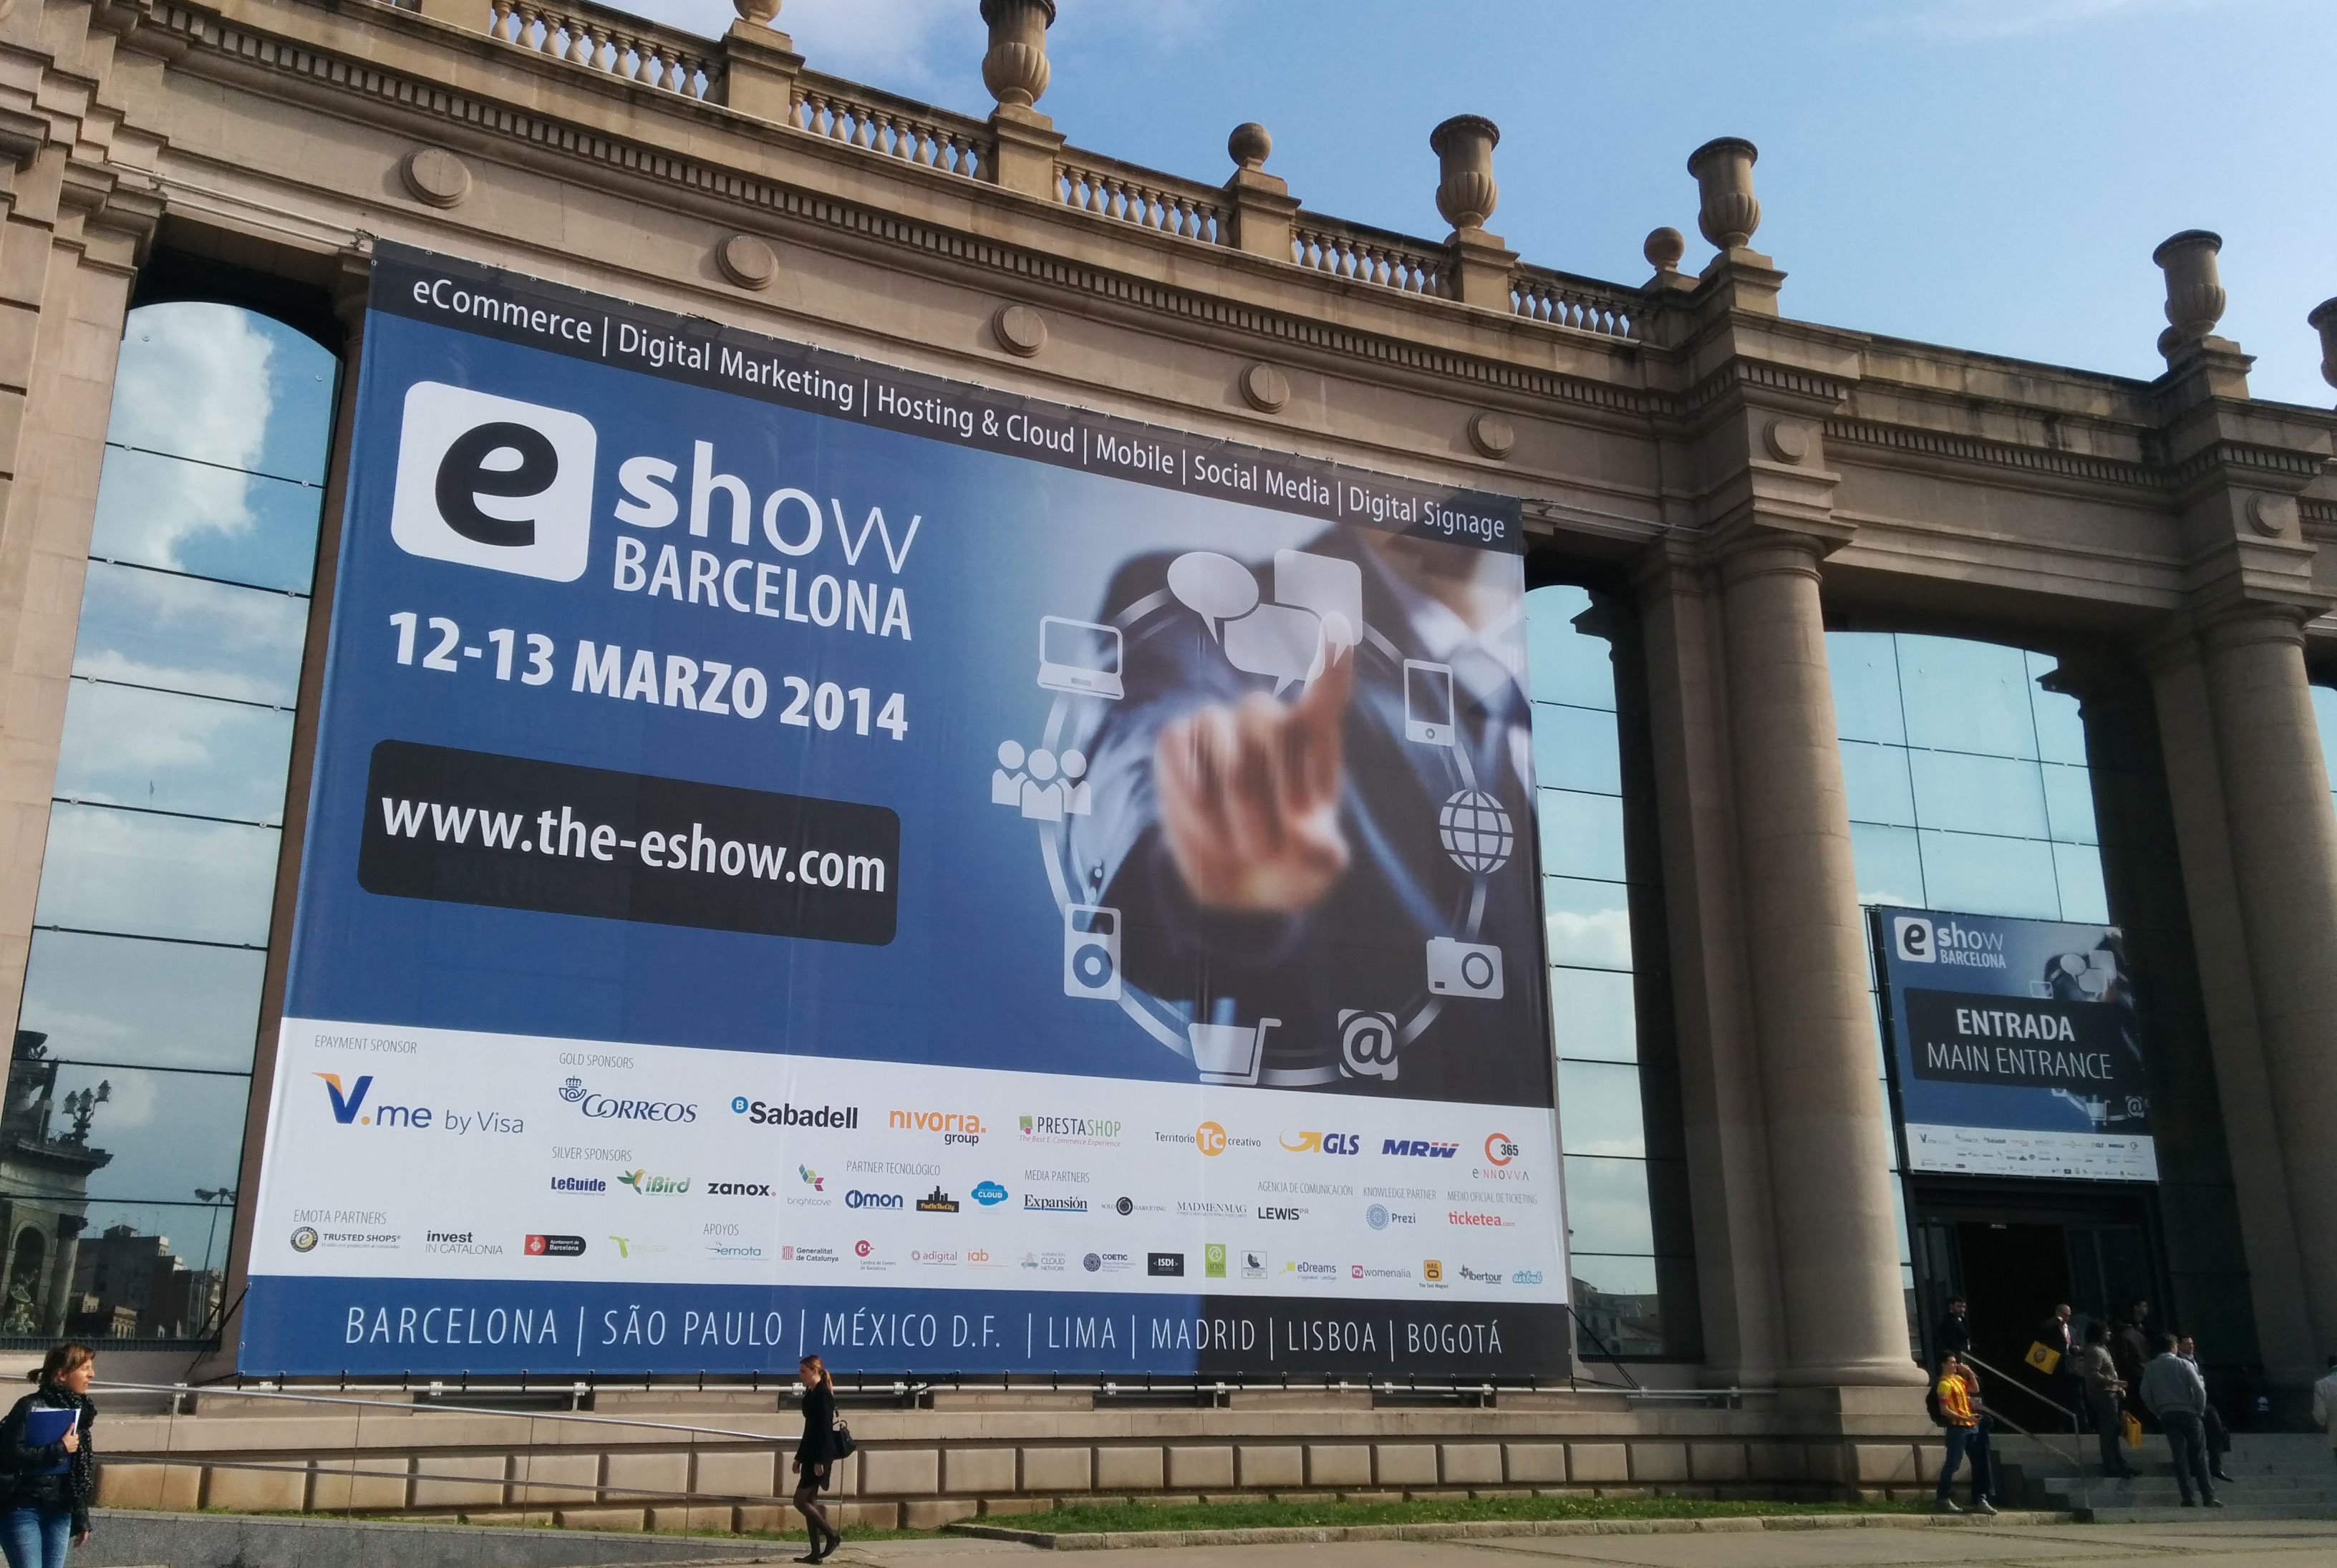 eShow Barcelona 2014